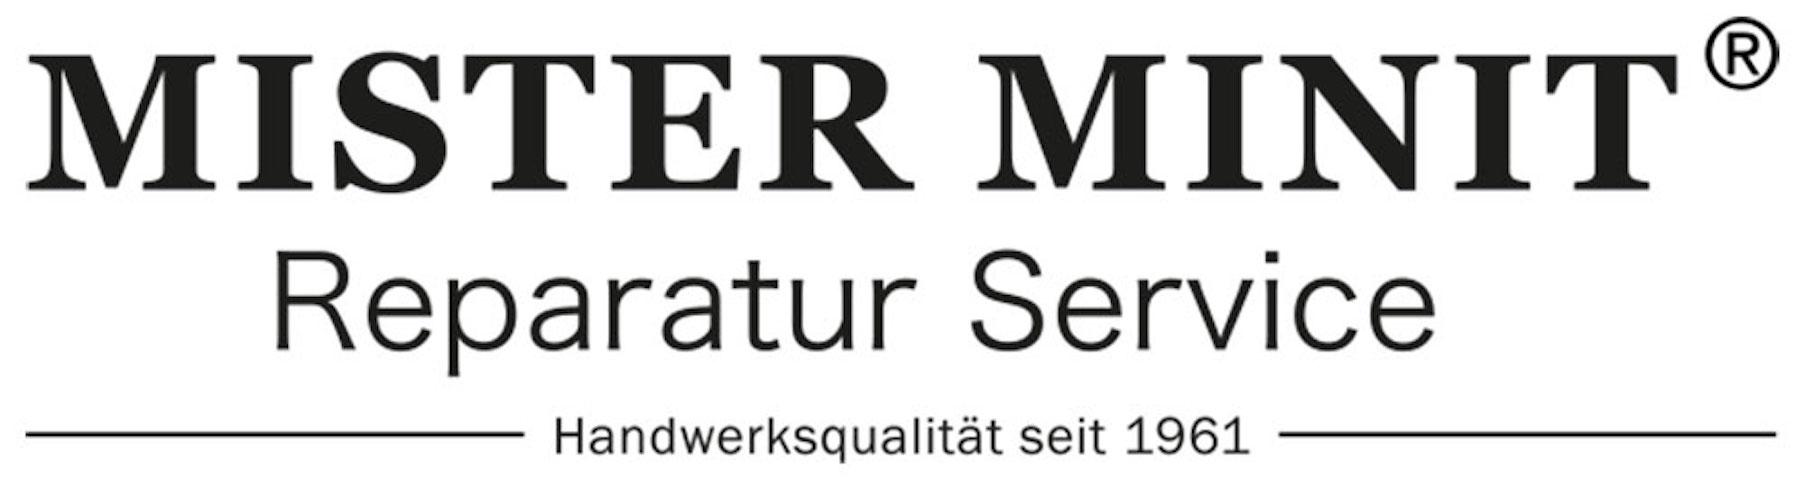 MISTER MINIT - Schlüssel & Schuhreparatur